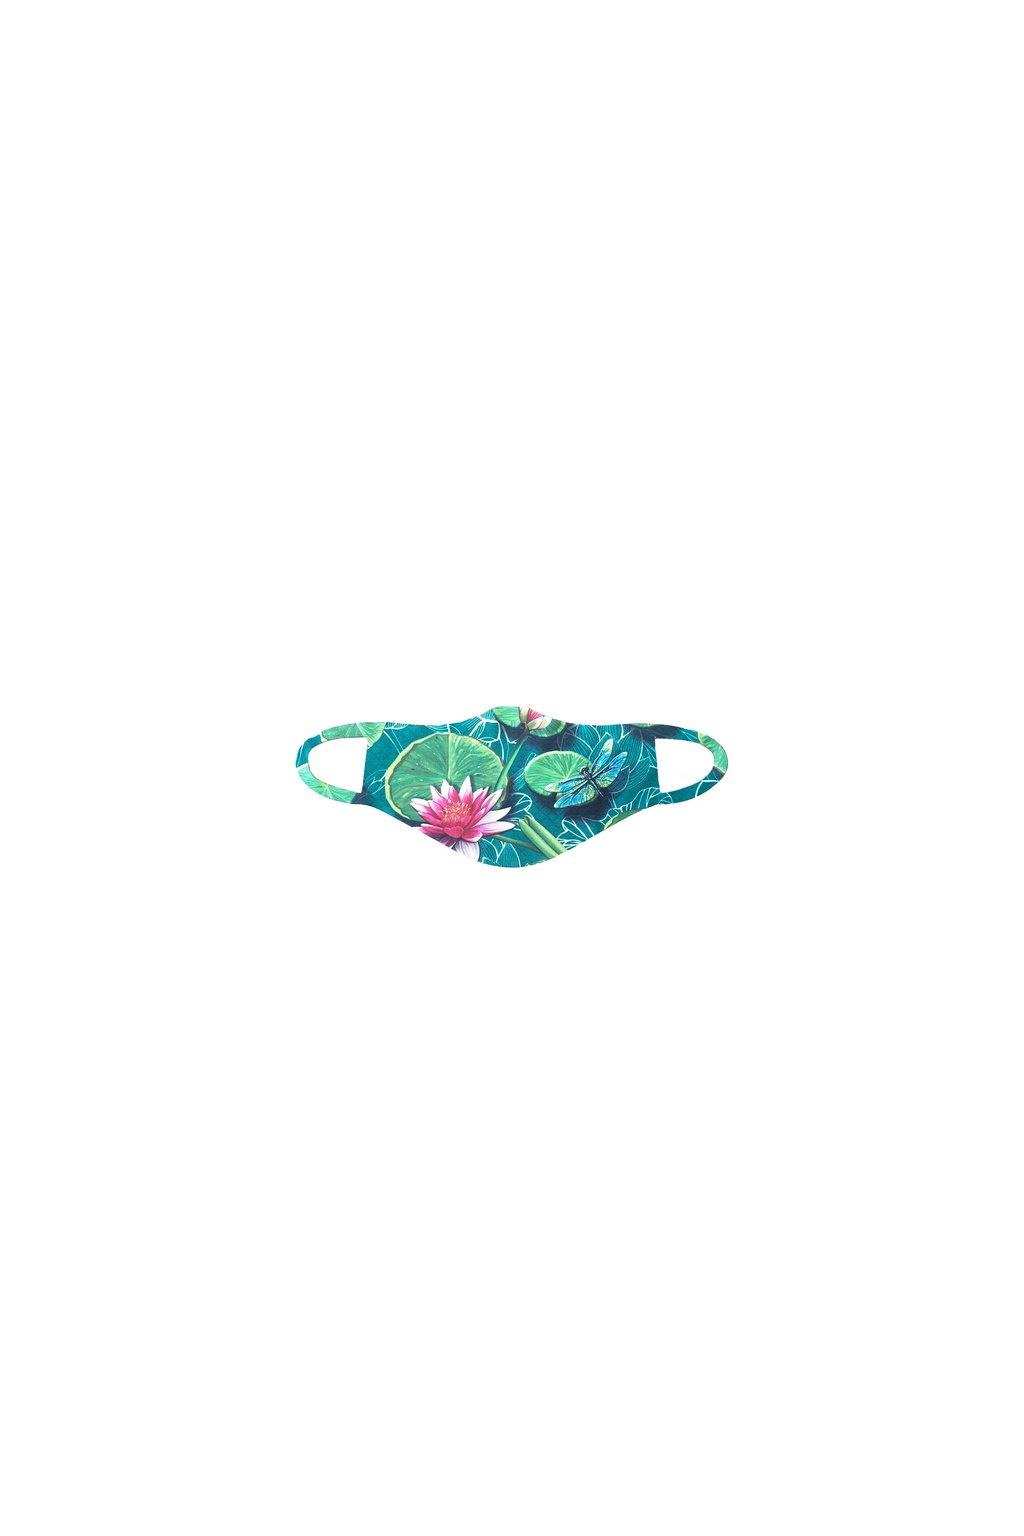 Maska Higieniczna Lily Pond MOH 11Z1 18140 679x706